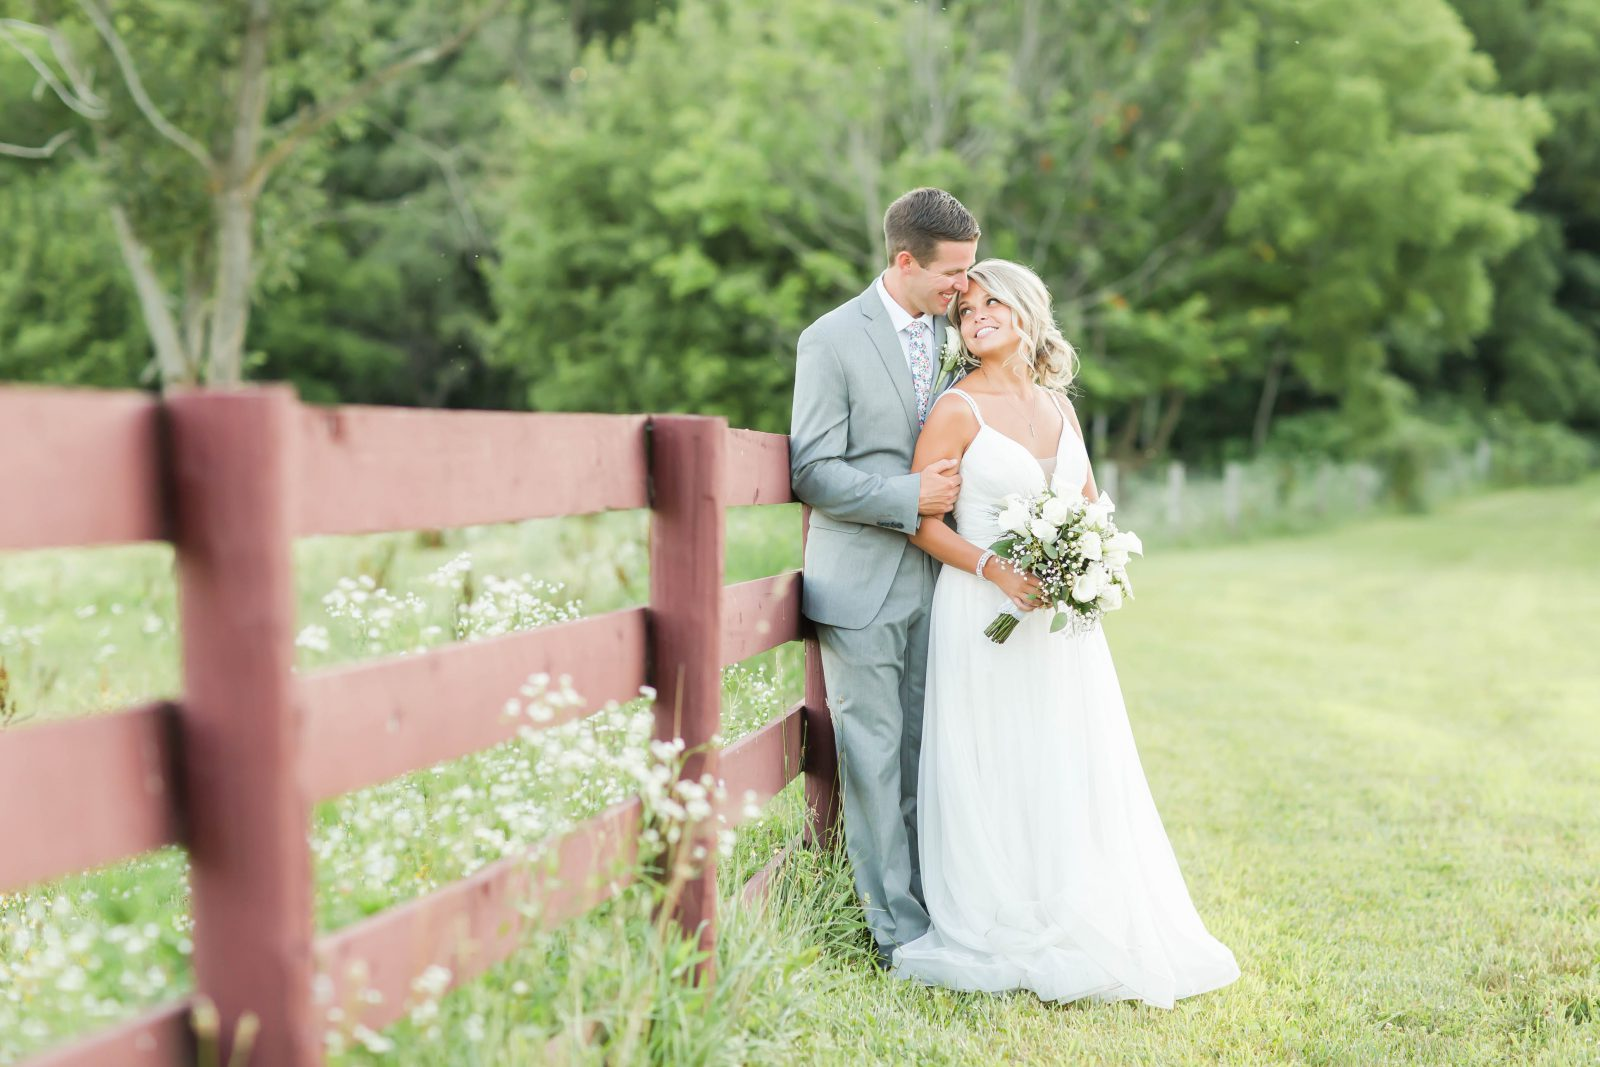 peacock-ridge-summer-wedding-photographer-akron-ohio-loren-jackson-photography-118